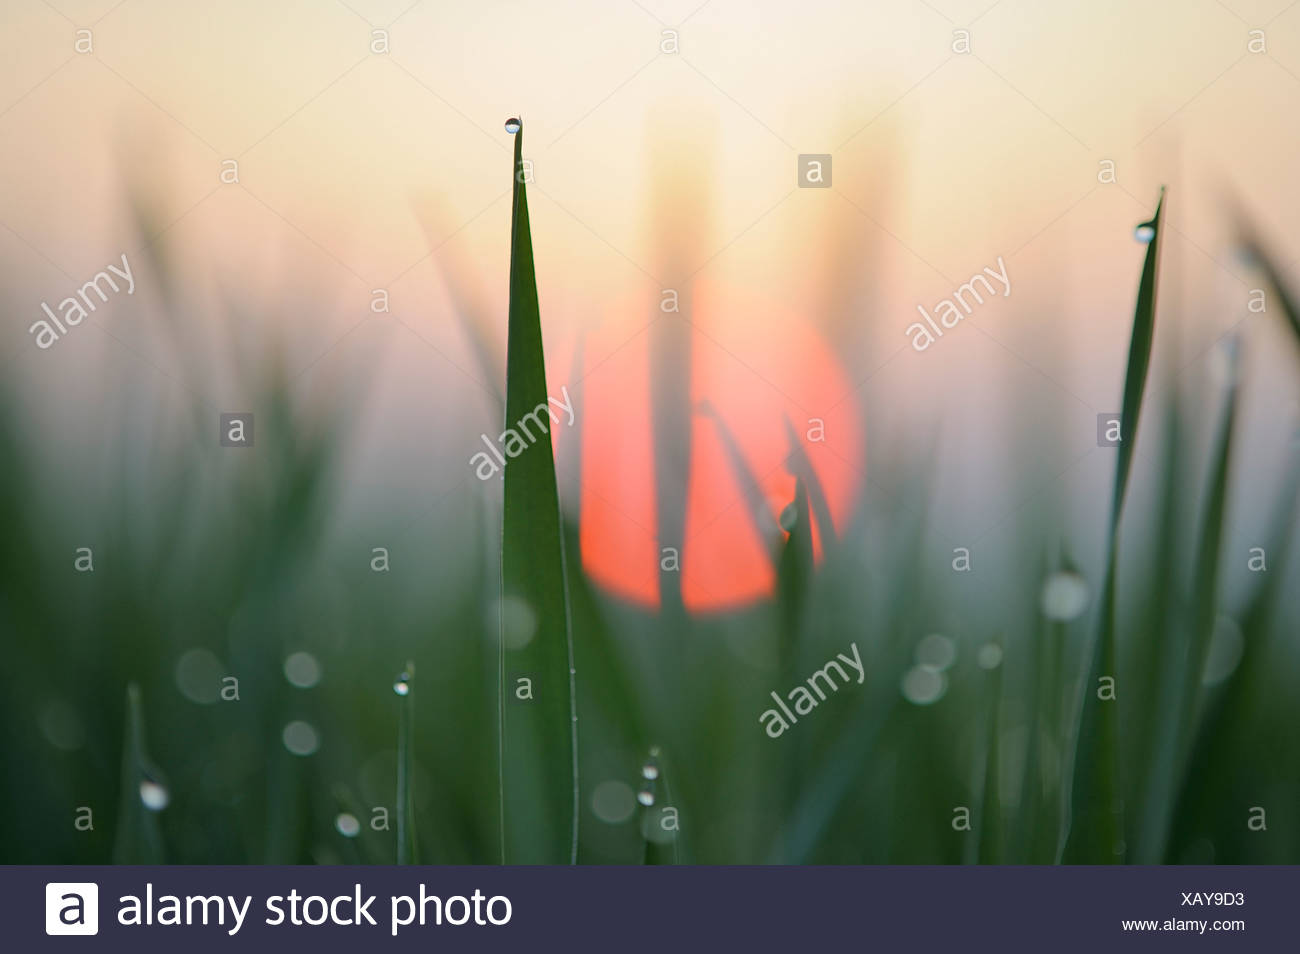 Germany, Bavaria, Sunrise, Dewdrops on corn leaves, close-up - Stock Image